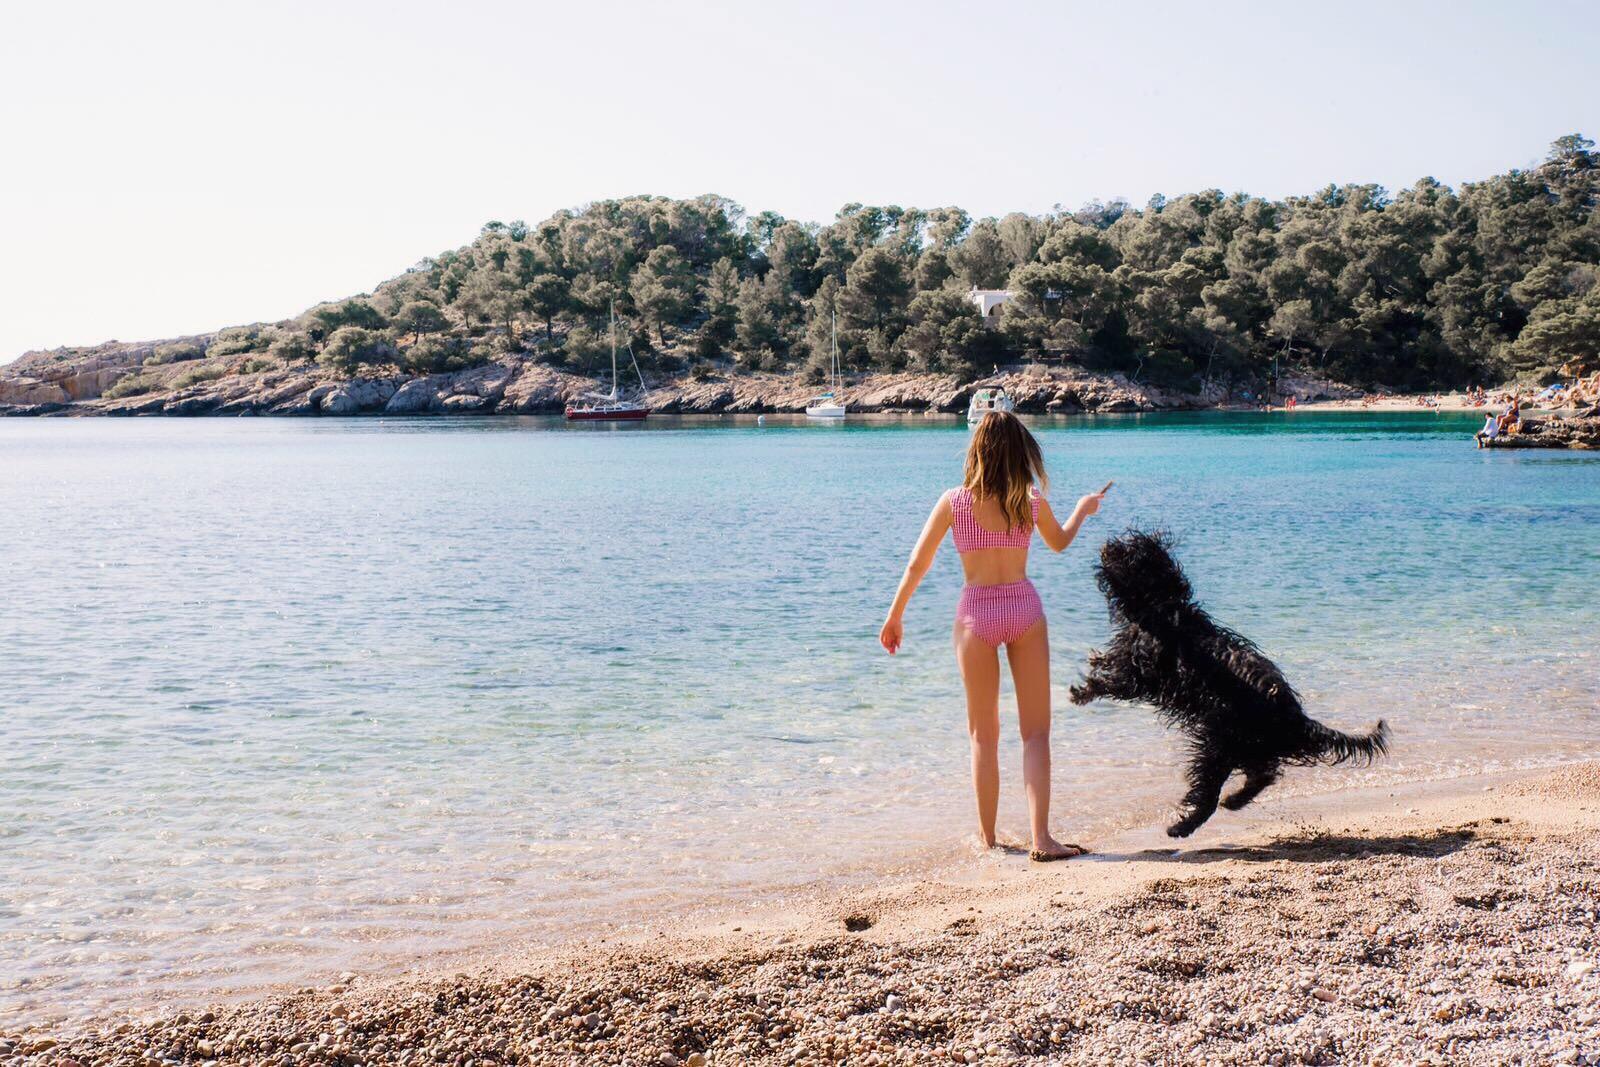 Playa Cala Xarraca, Ibiza - by Ben Holbrook